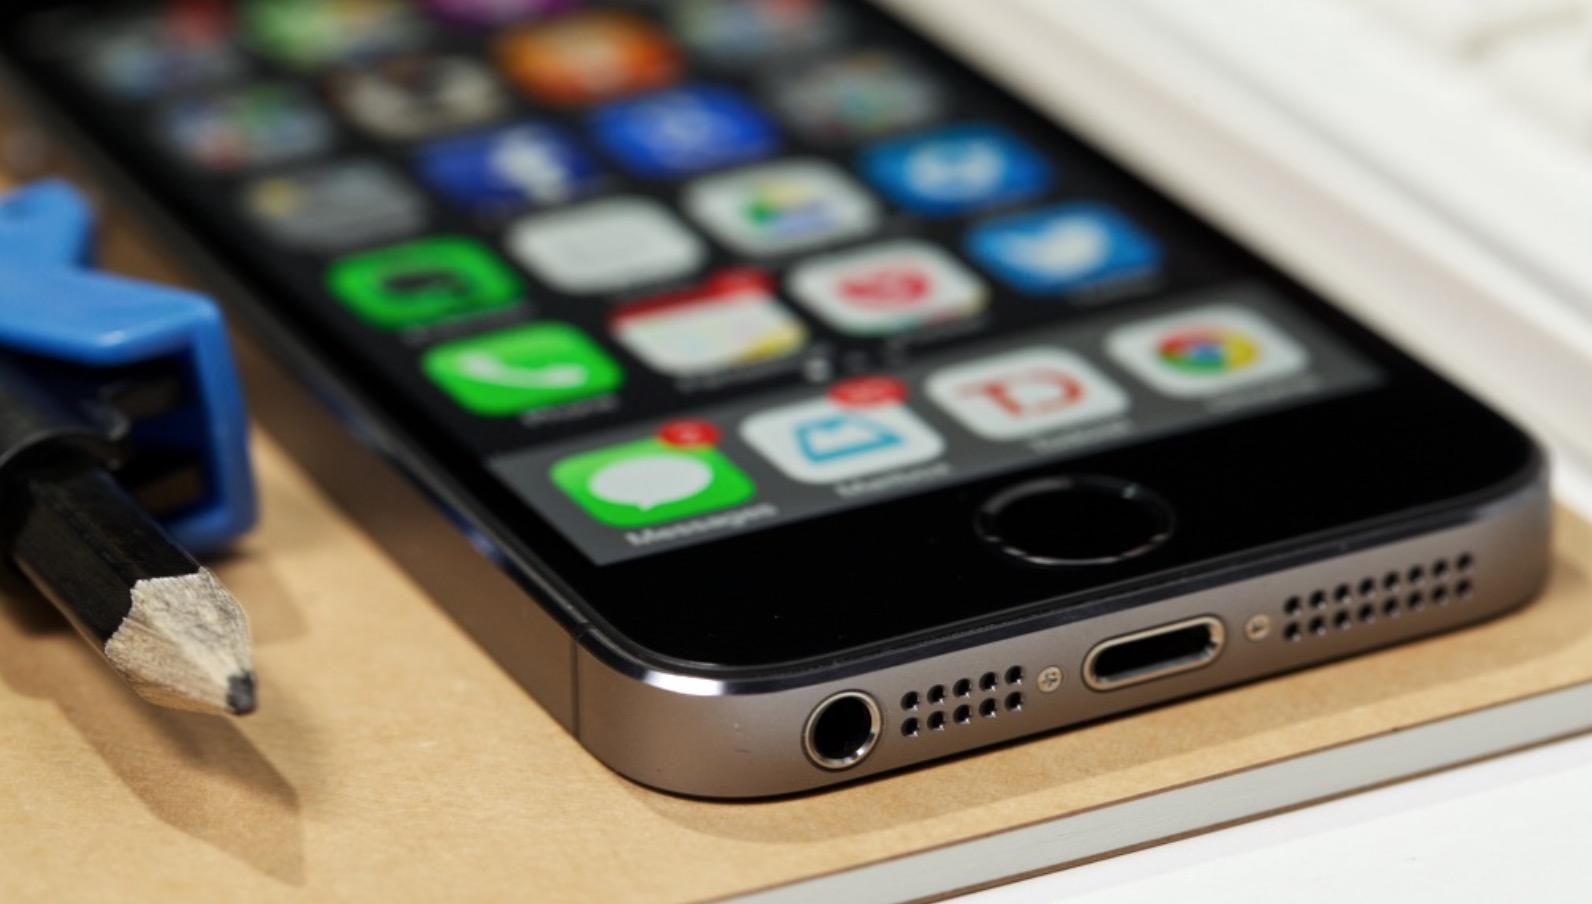 iPhone 5S salva la vita